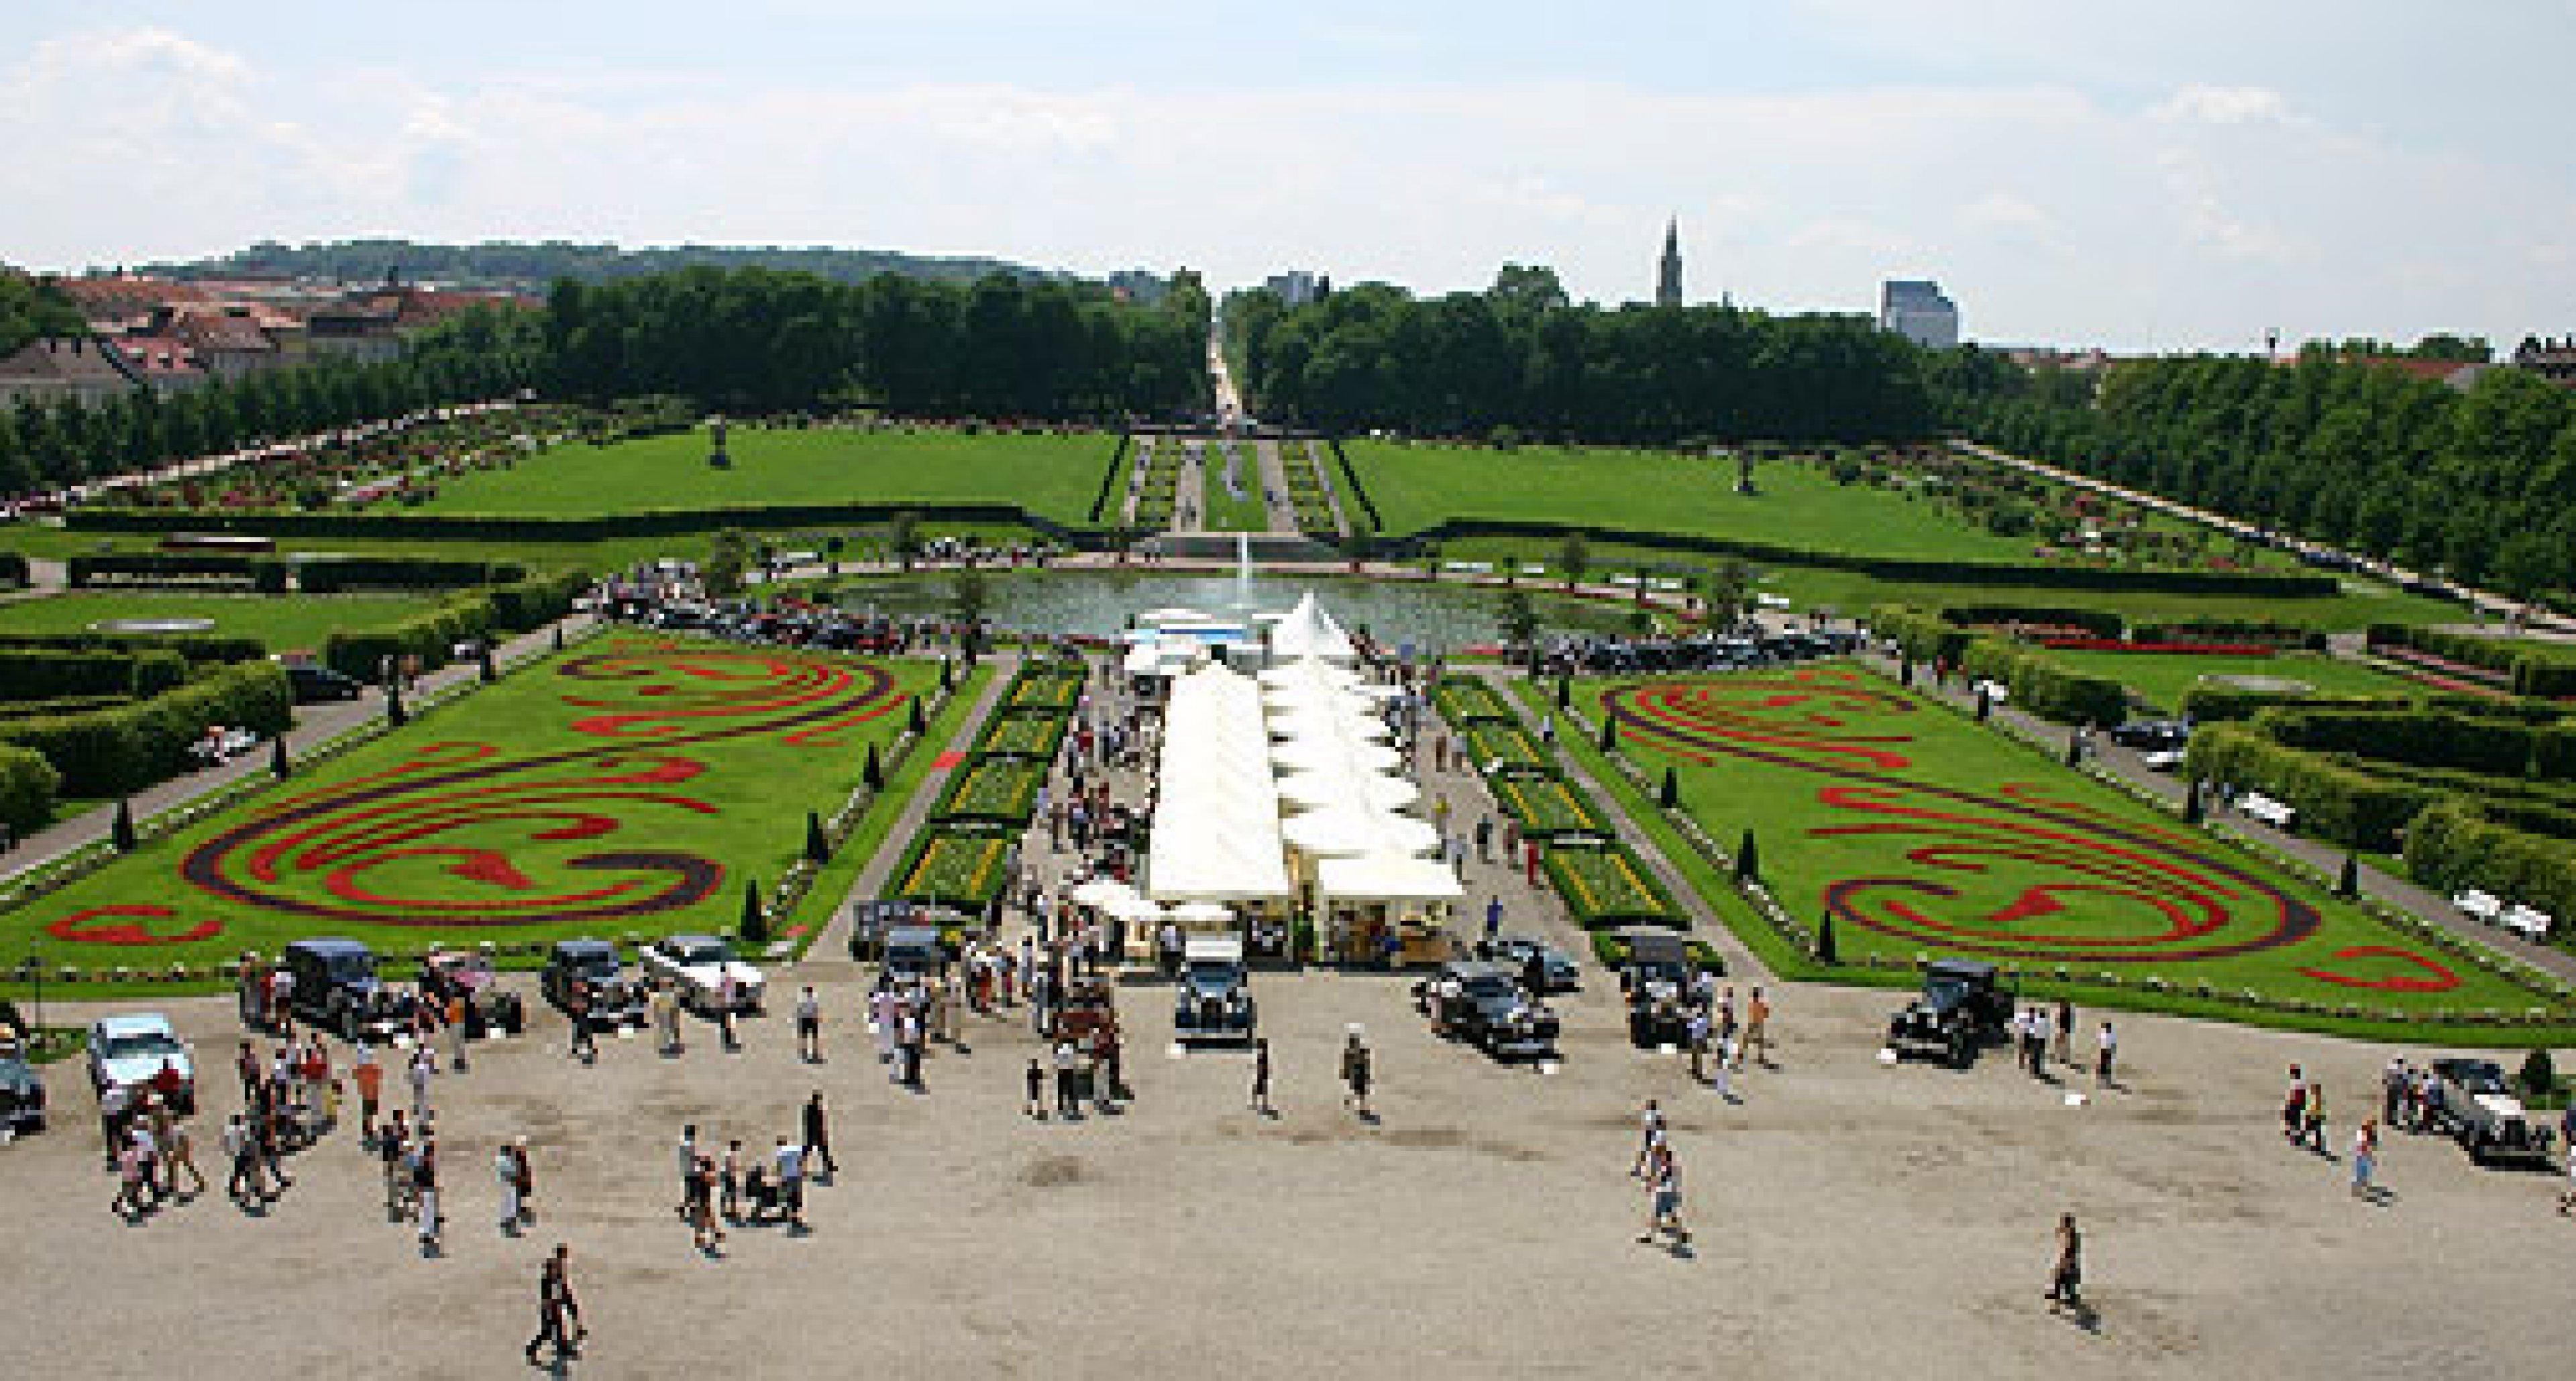 Retro Classics meets Barock 2008: Schönheiten im Schlosspark